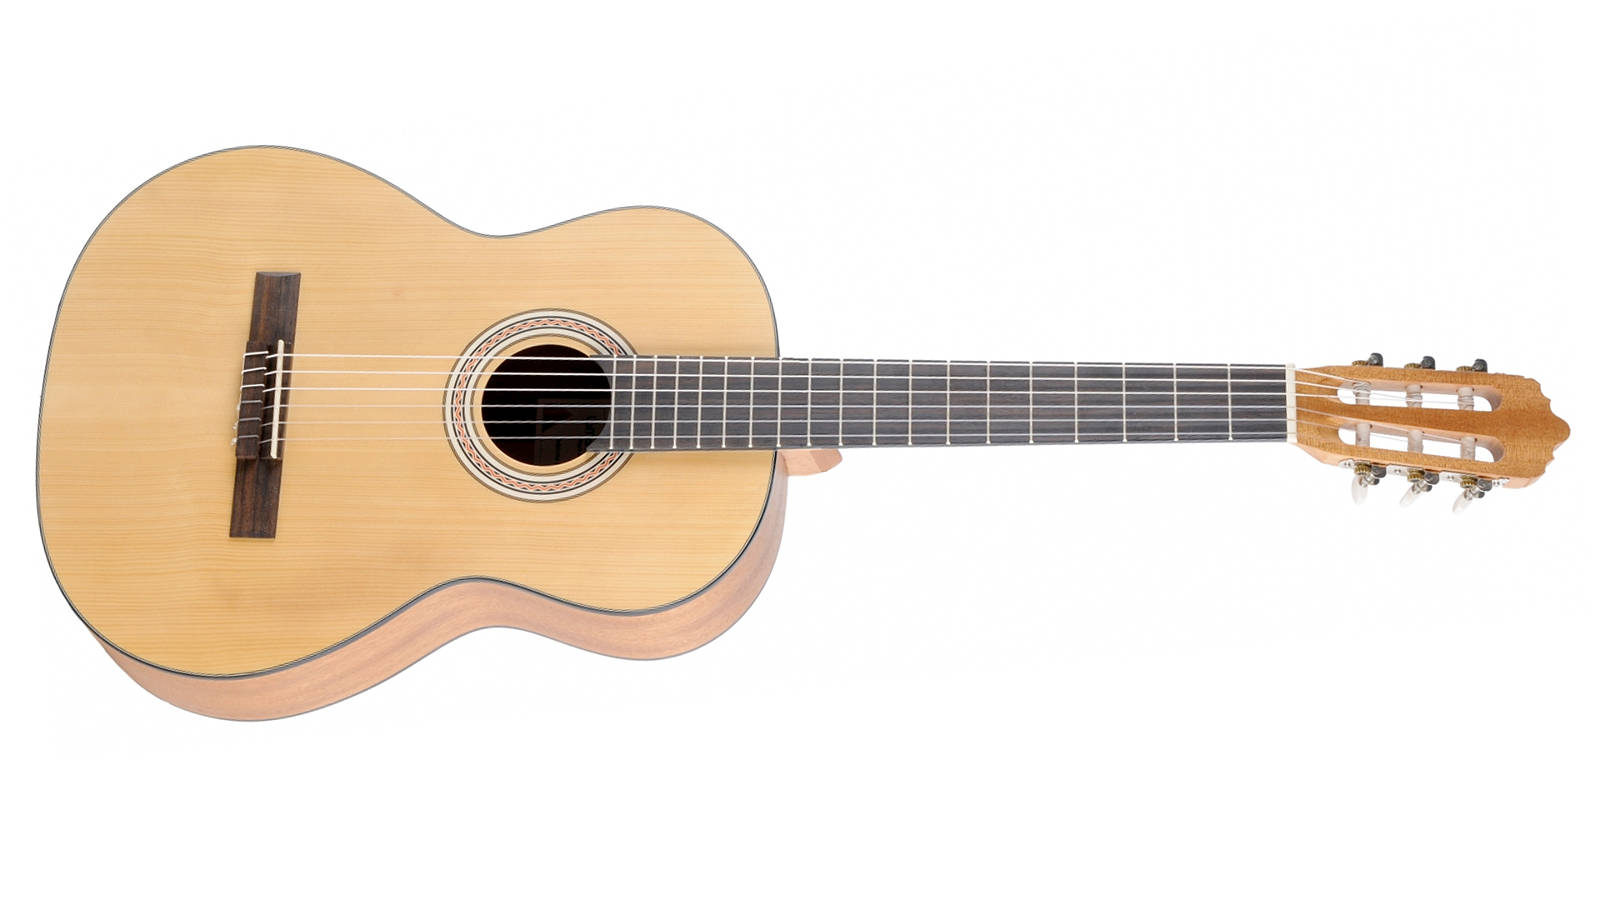 La Mancha Rubinito LSM 59 Konzertgitarre 3/4